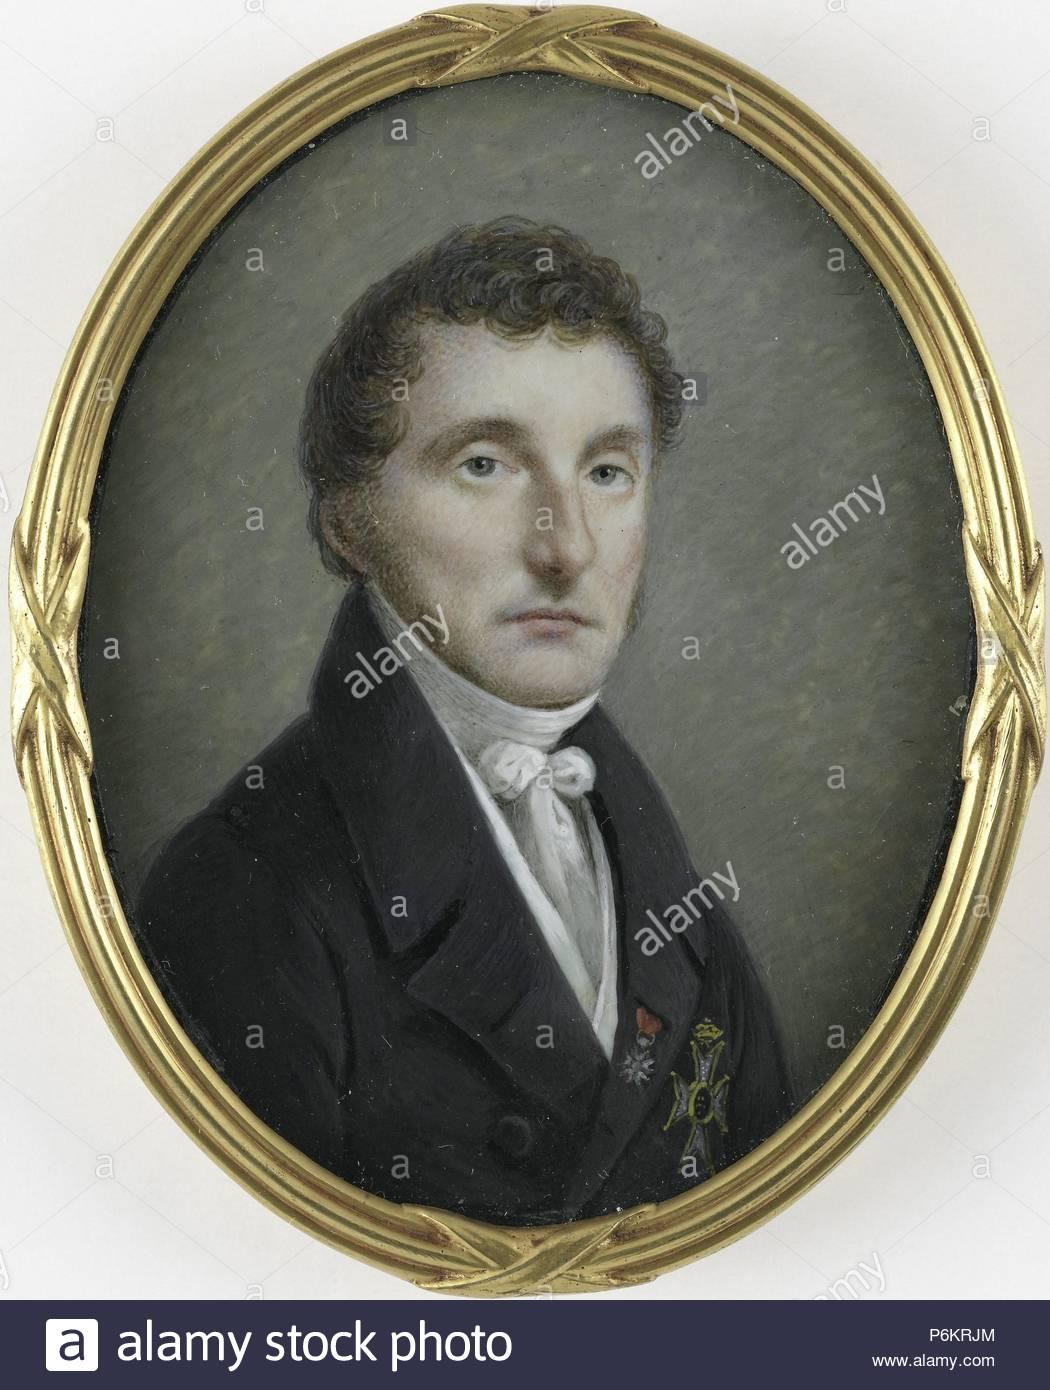 Pieter de Riemer (1769-1831). Profesor de Obstetricia, cirujano consultor del rey Guillermo I, Johannes Hari (I), 1800 - 1831. Imagen De Stock